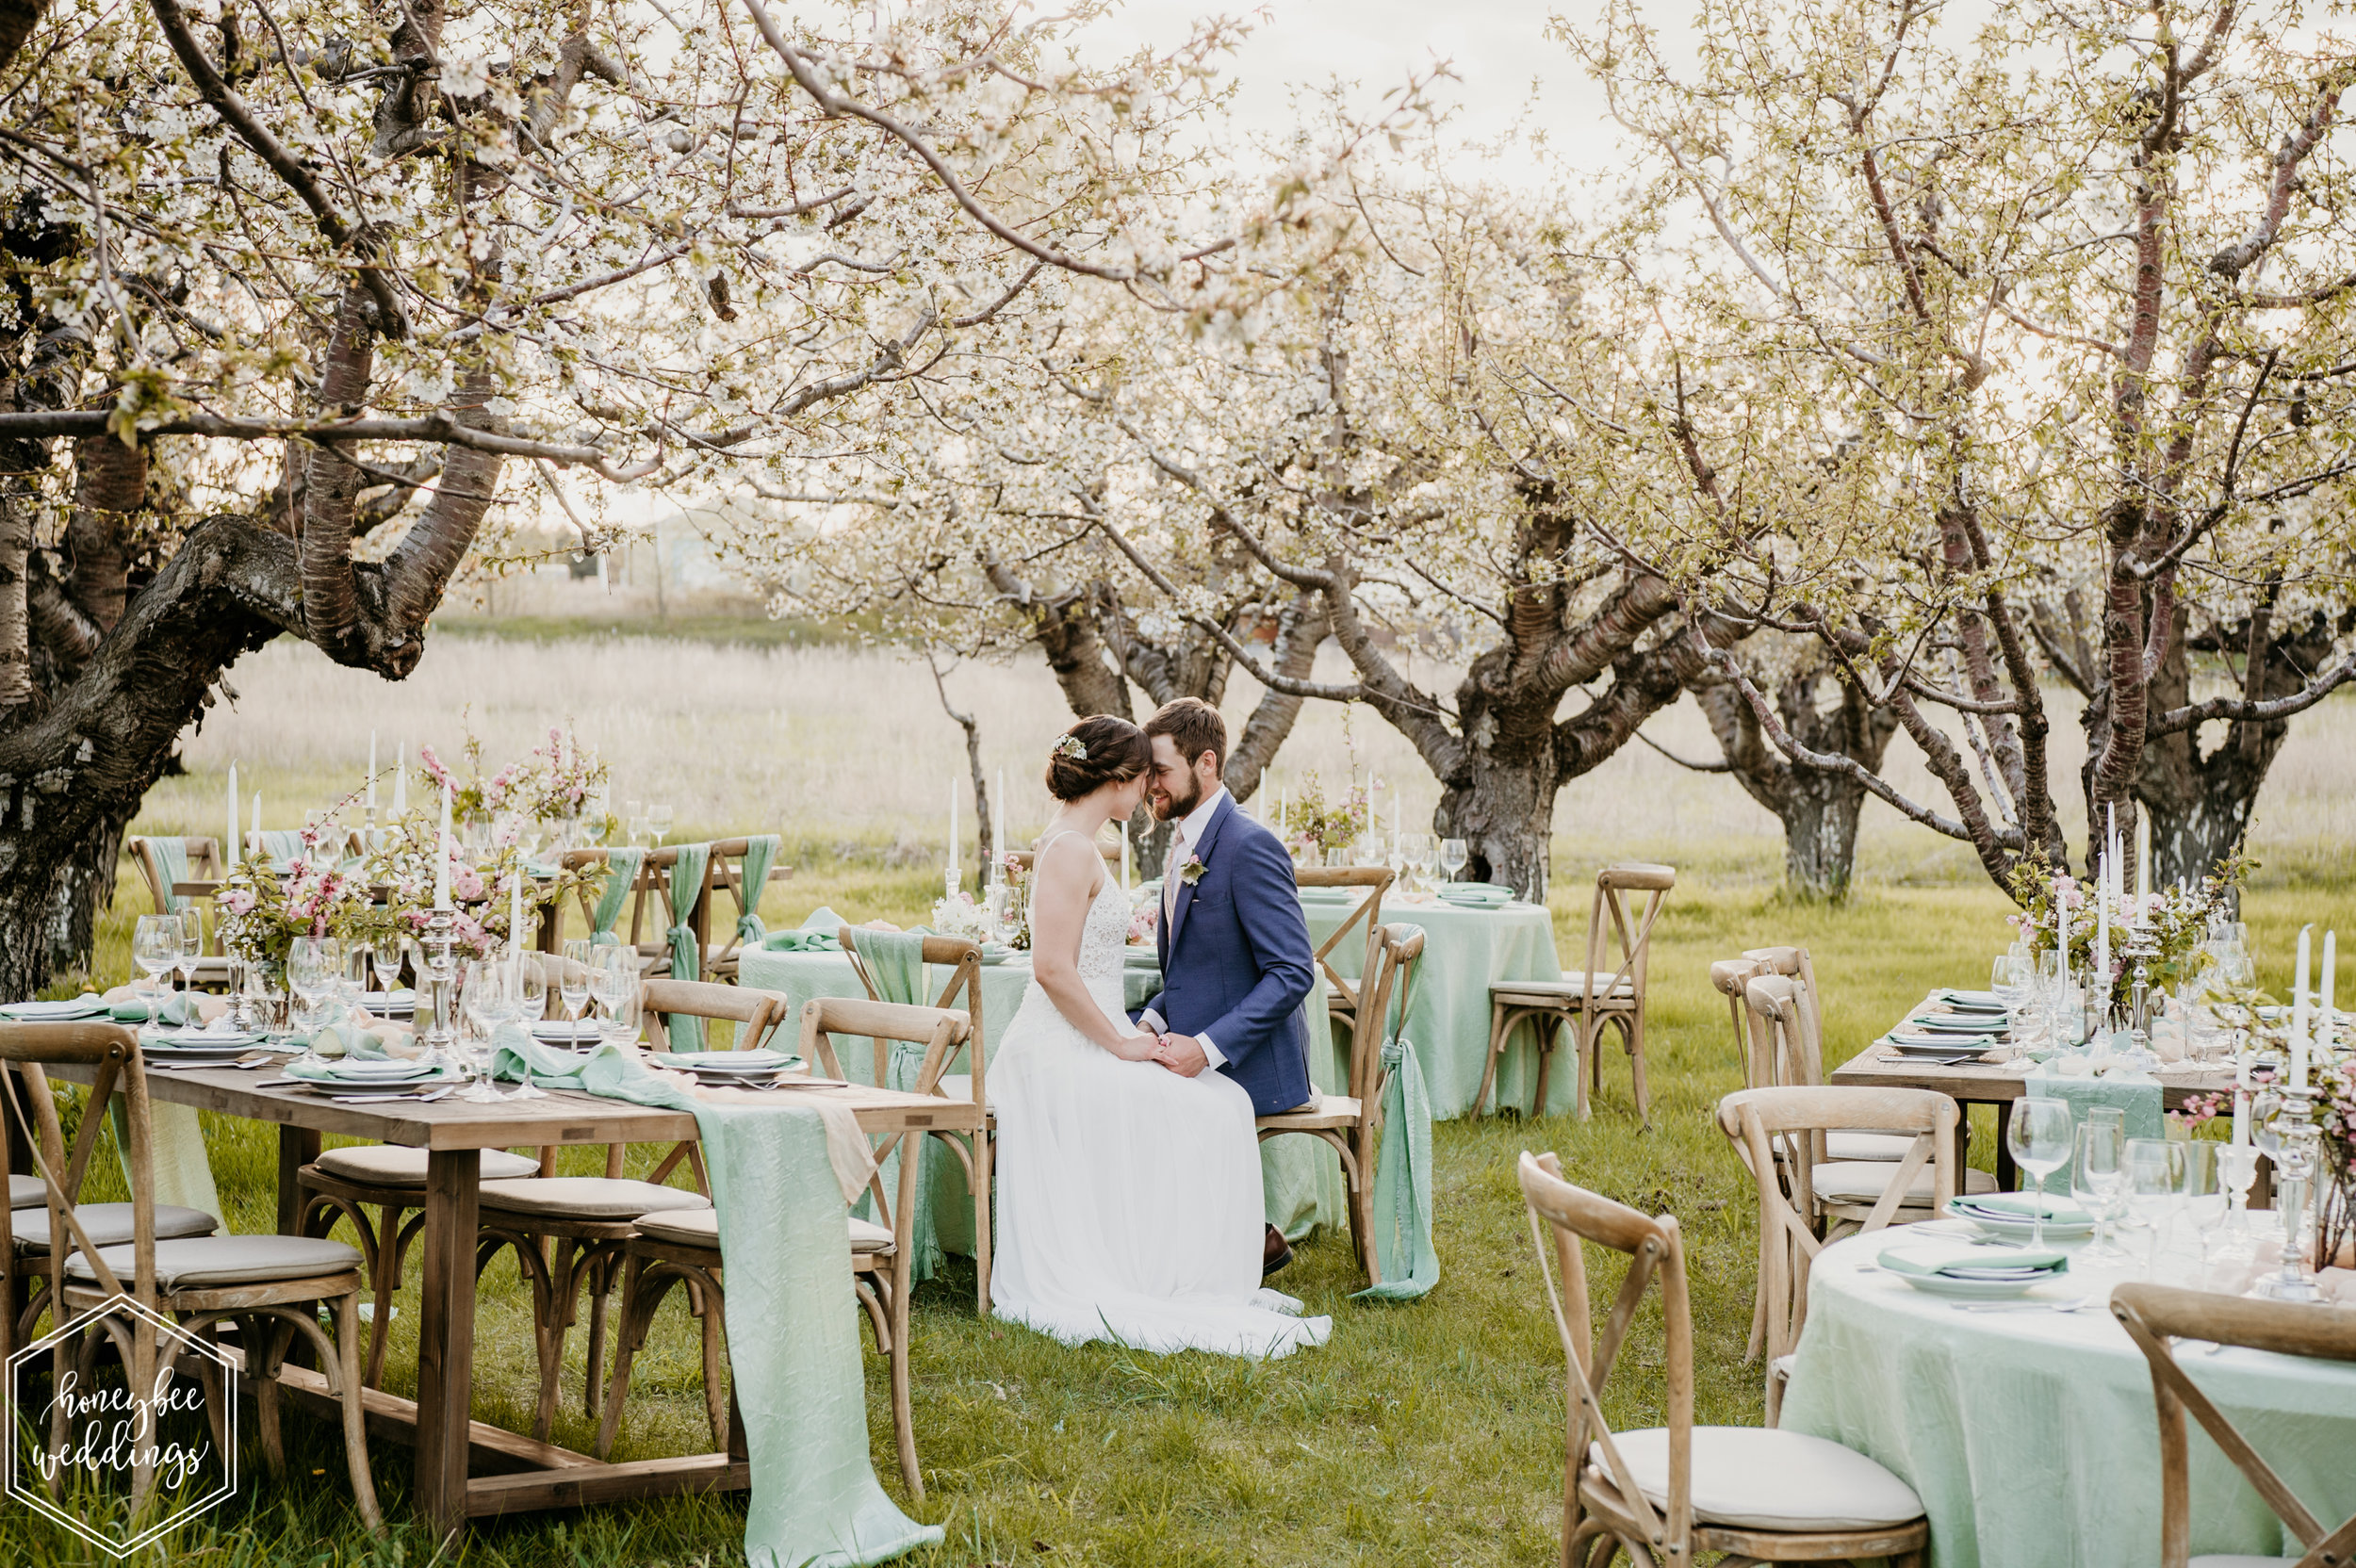 164Cherry Blossom Wedding_Styled Photoshoot_Honeybee Weddings_May 11, 2019-306.jpg